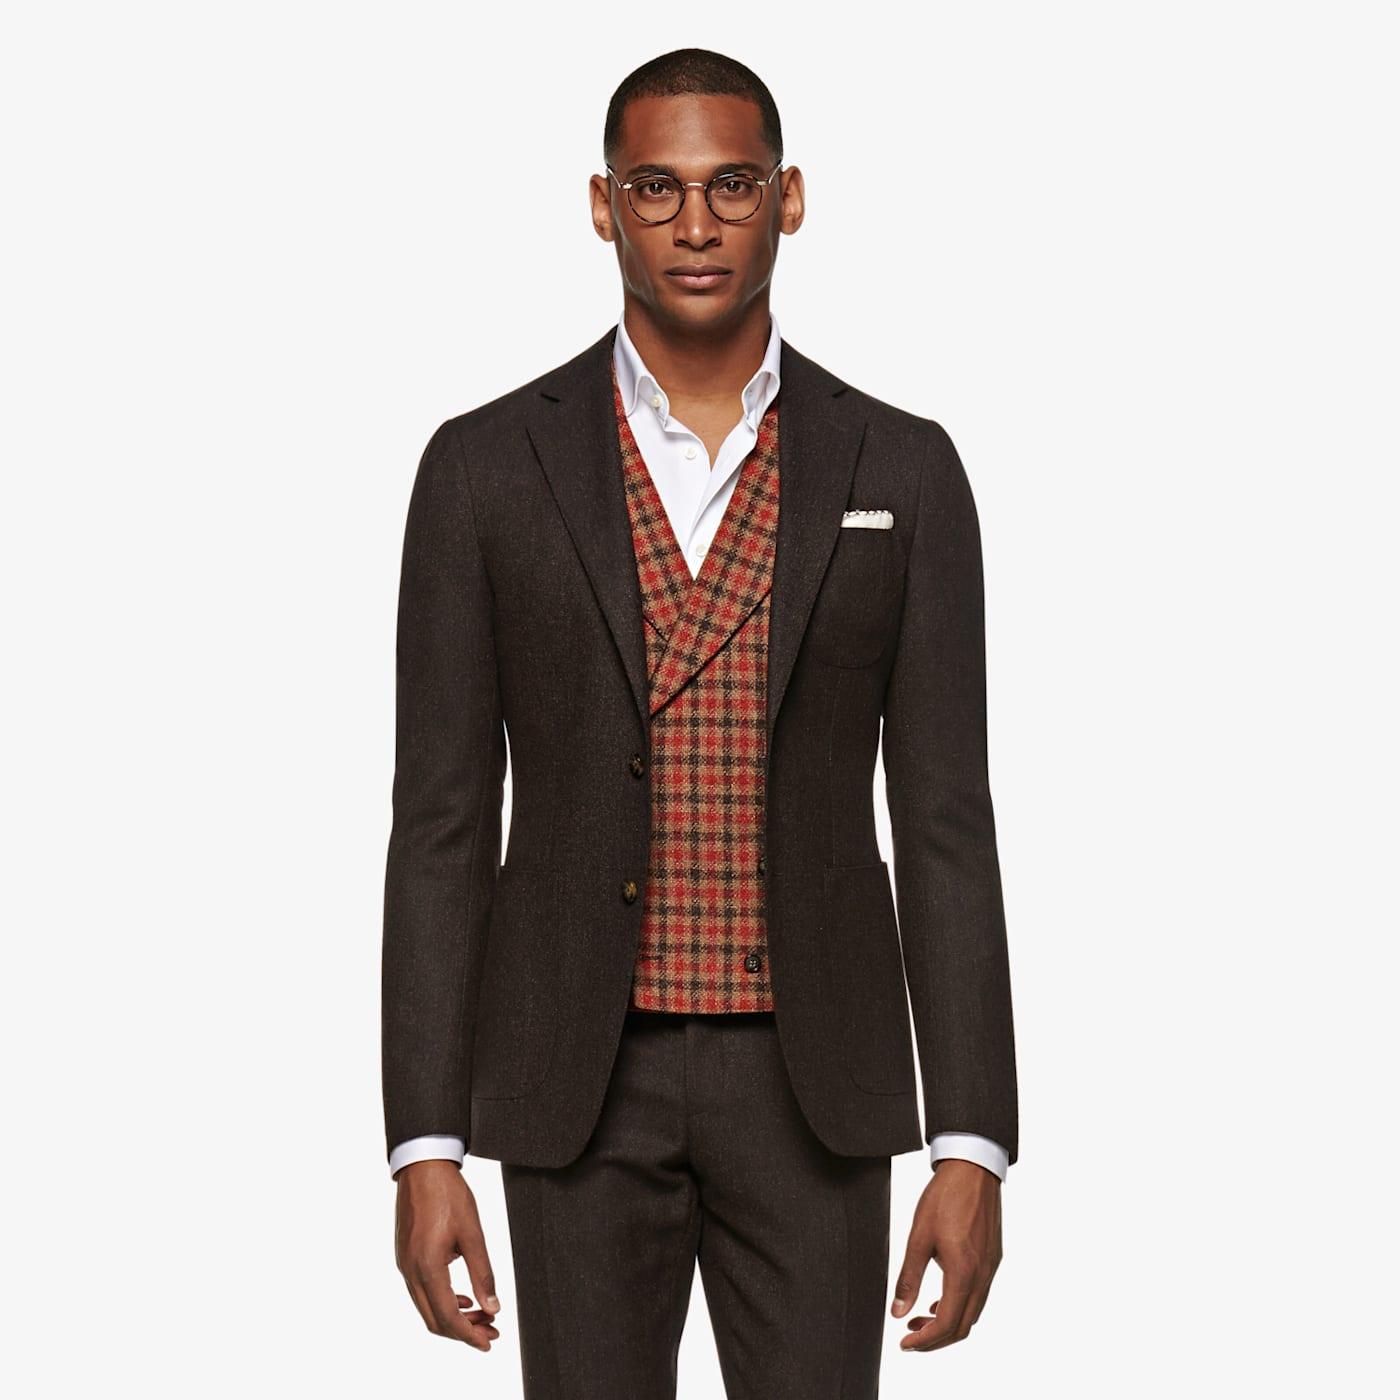 Edwardian Men's Fashion & Clothing 1900-1910s Red Waistcoat $189.00 AT vintagedancer.com